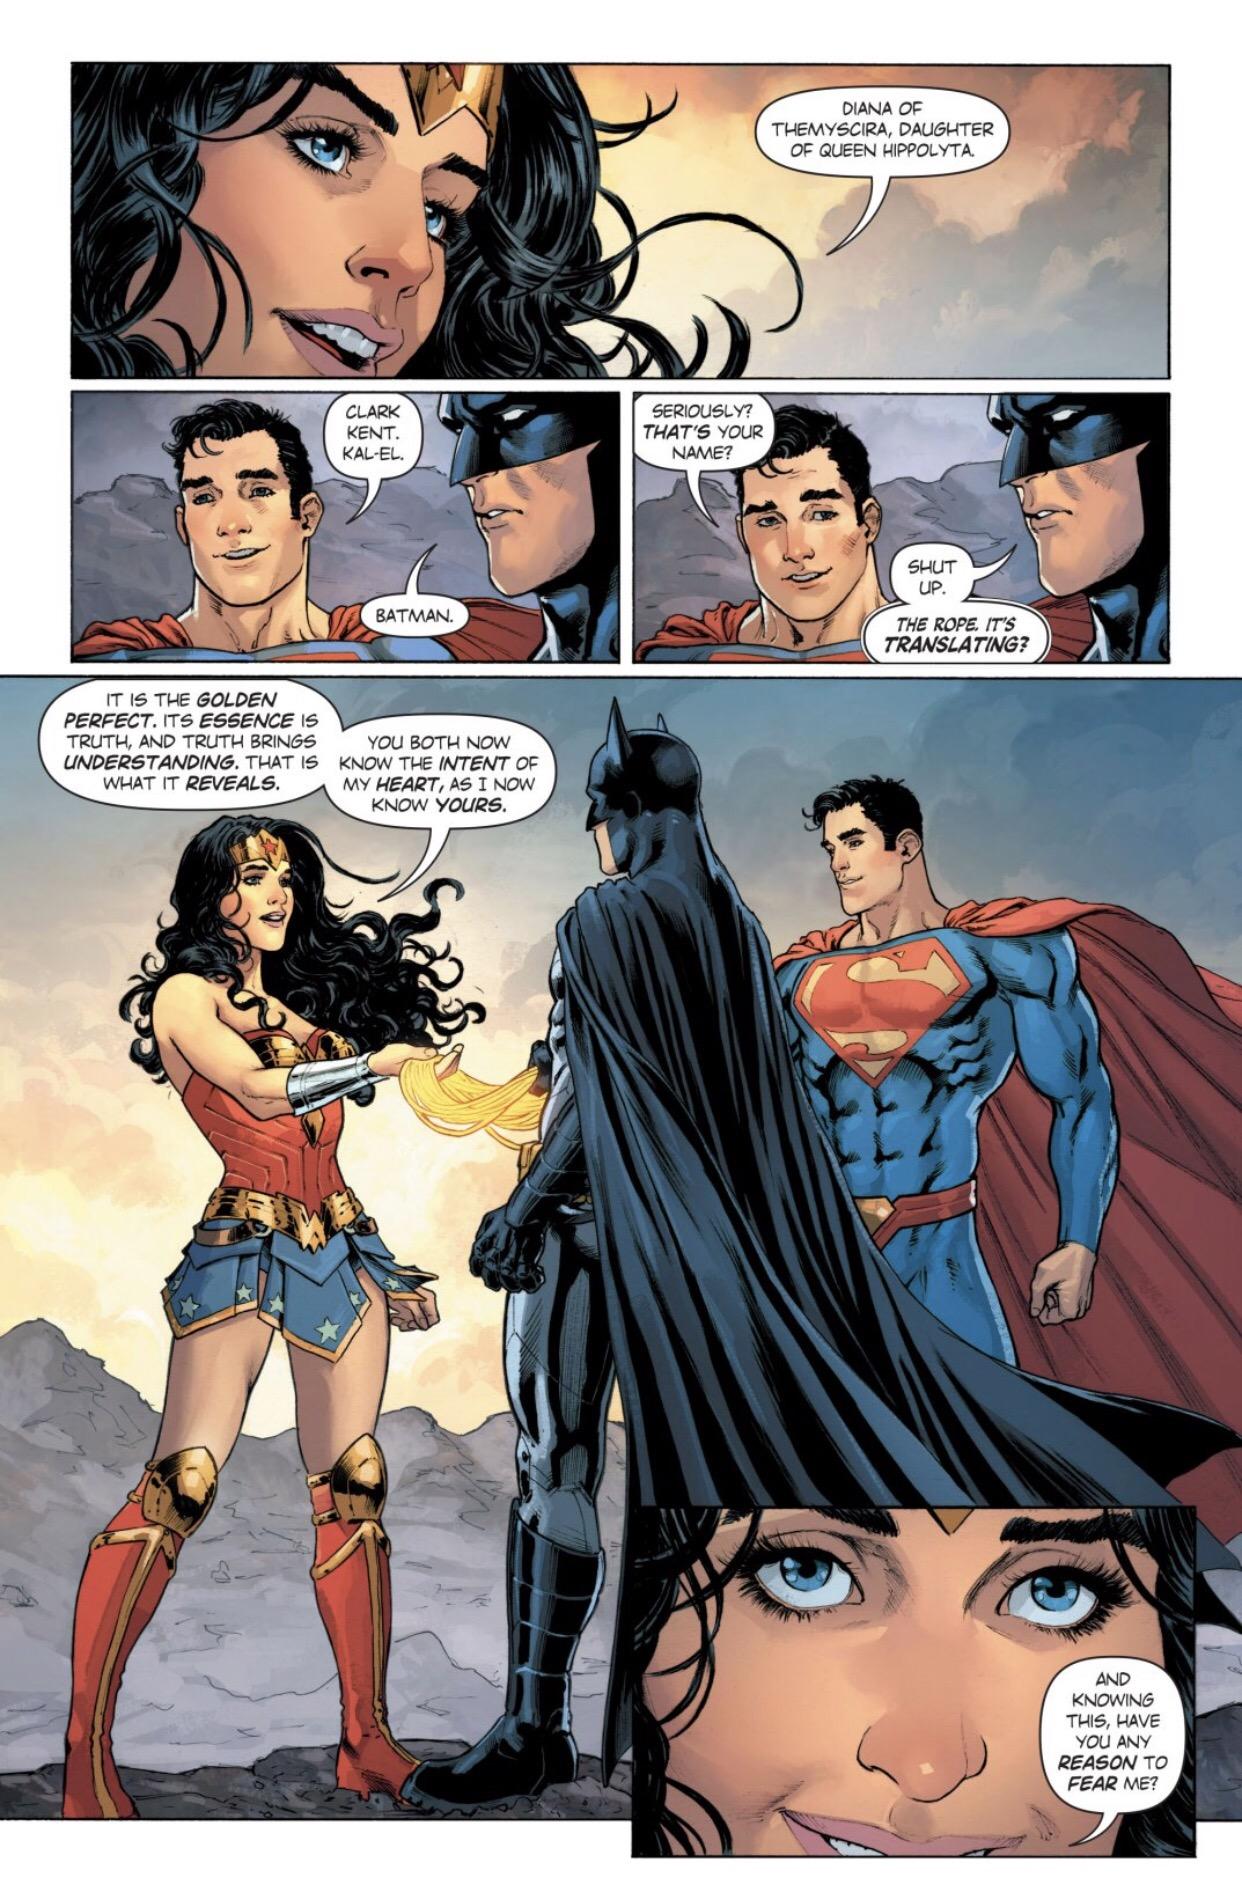 Does Wonder Woman's Lasso of Truth Work on Batman?